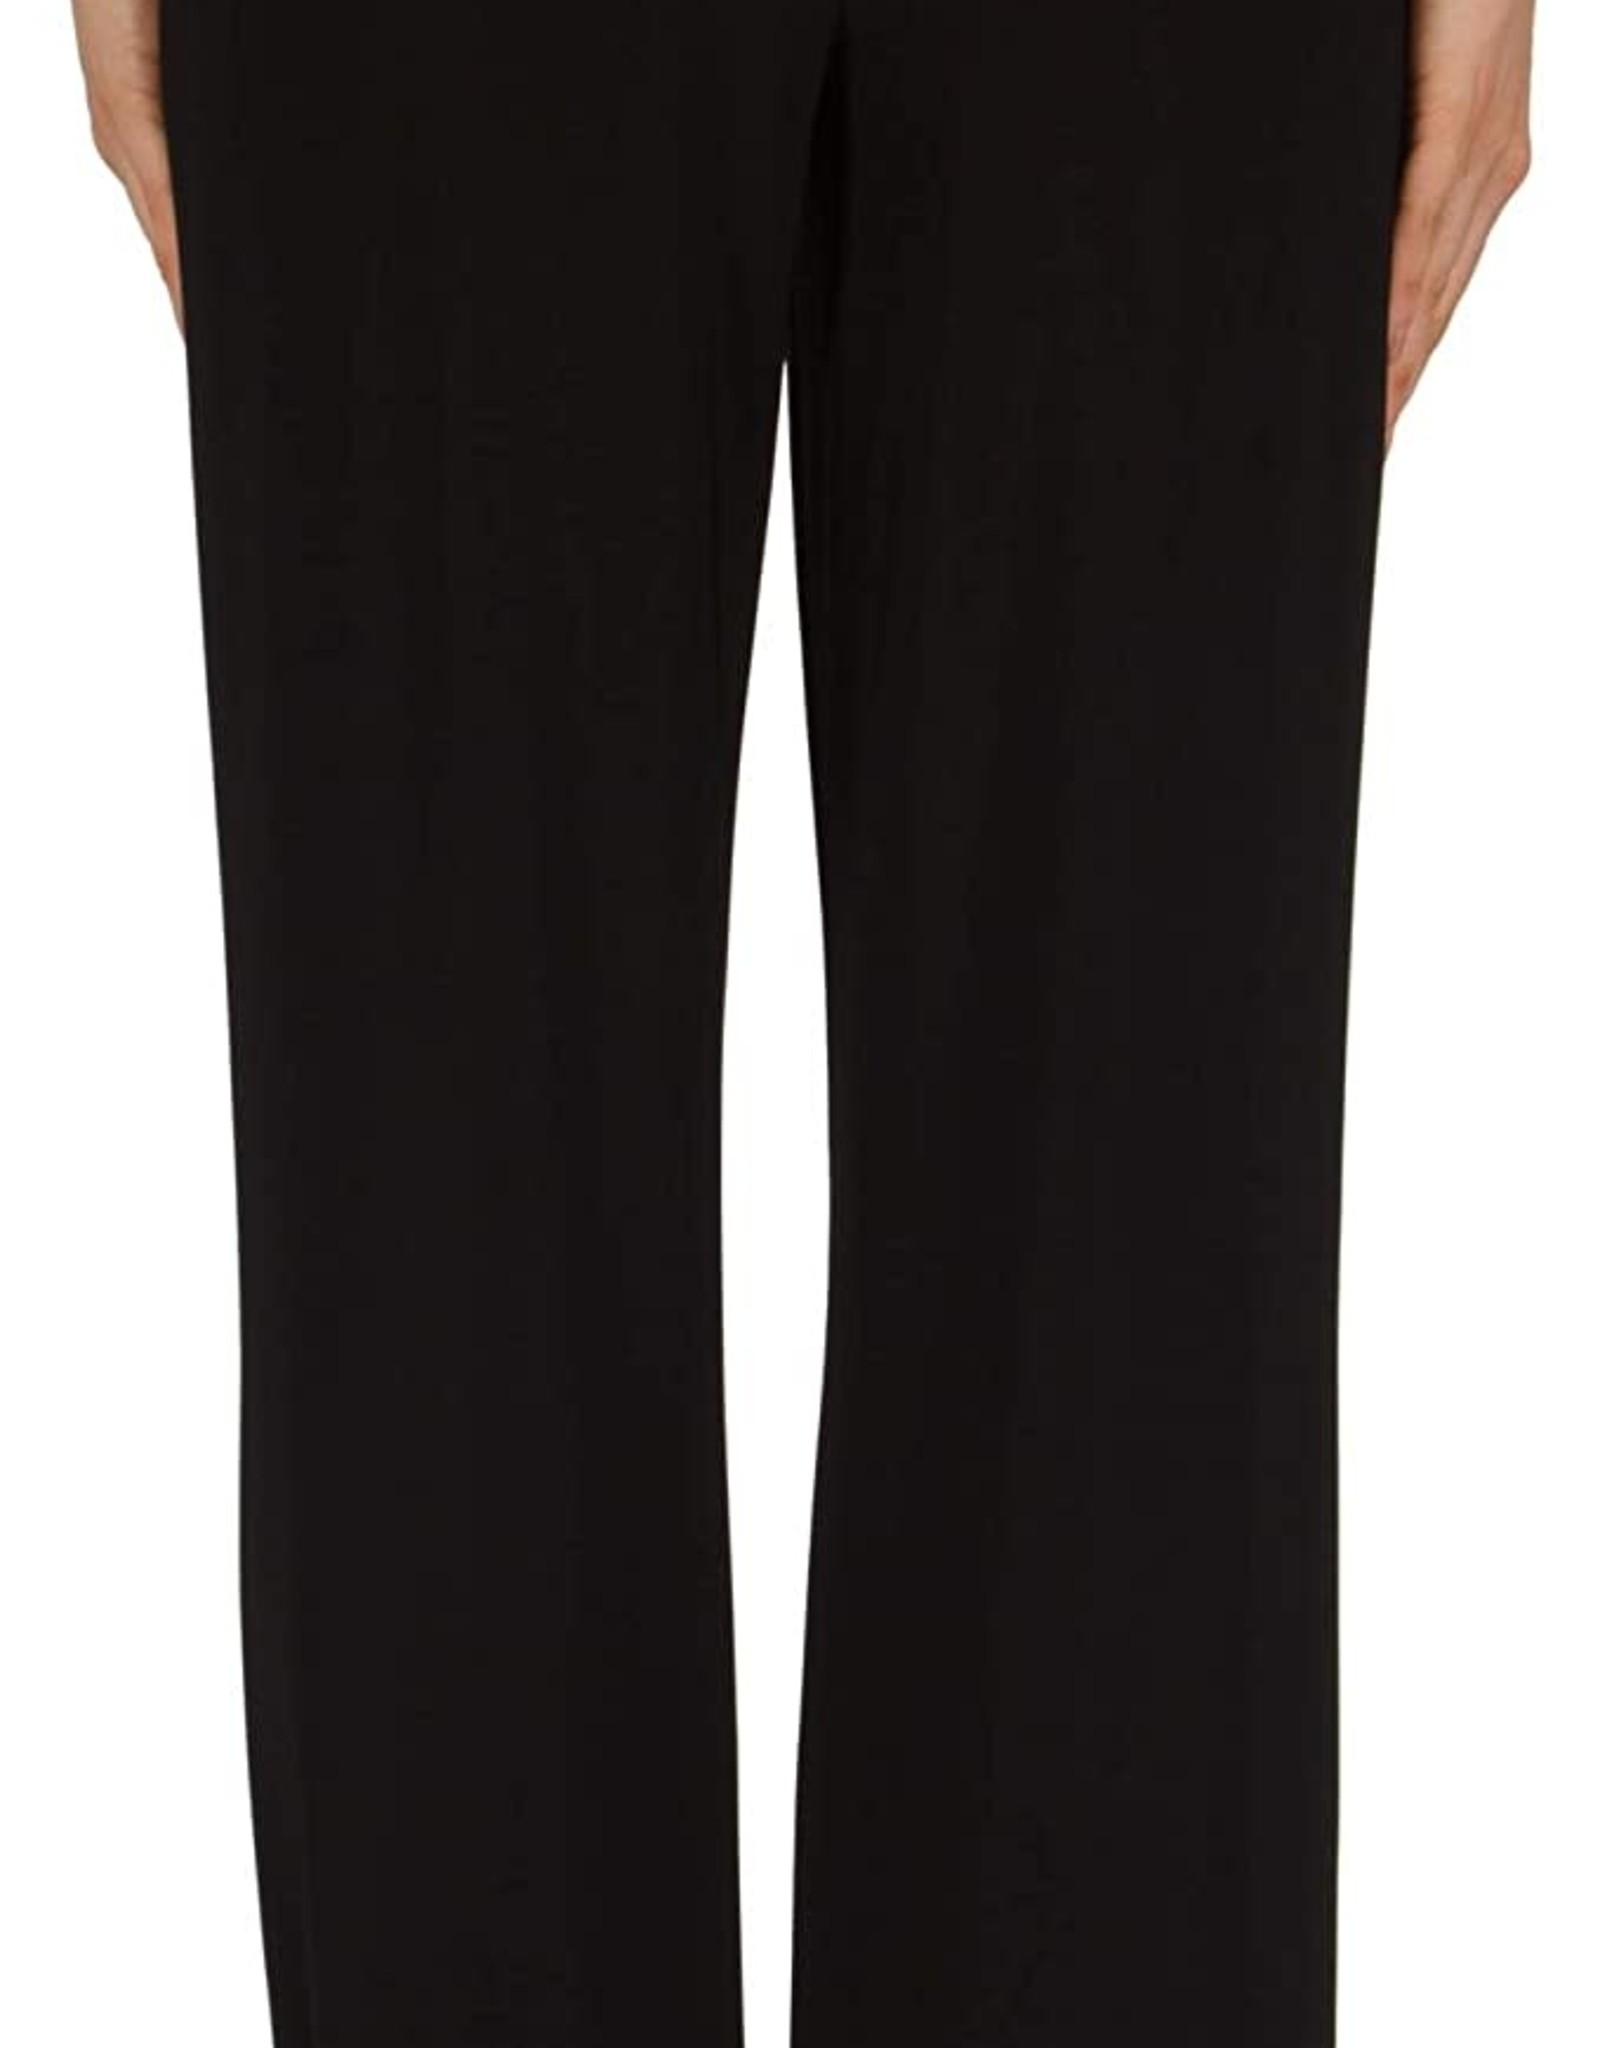 Joseph Ribkoff Black Pull-On Straight Leg Pant w/Pockets